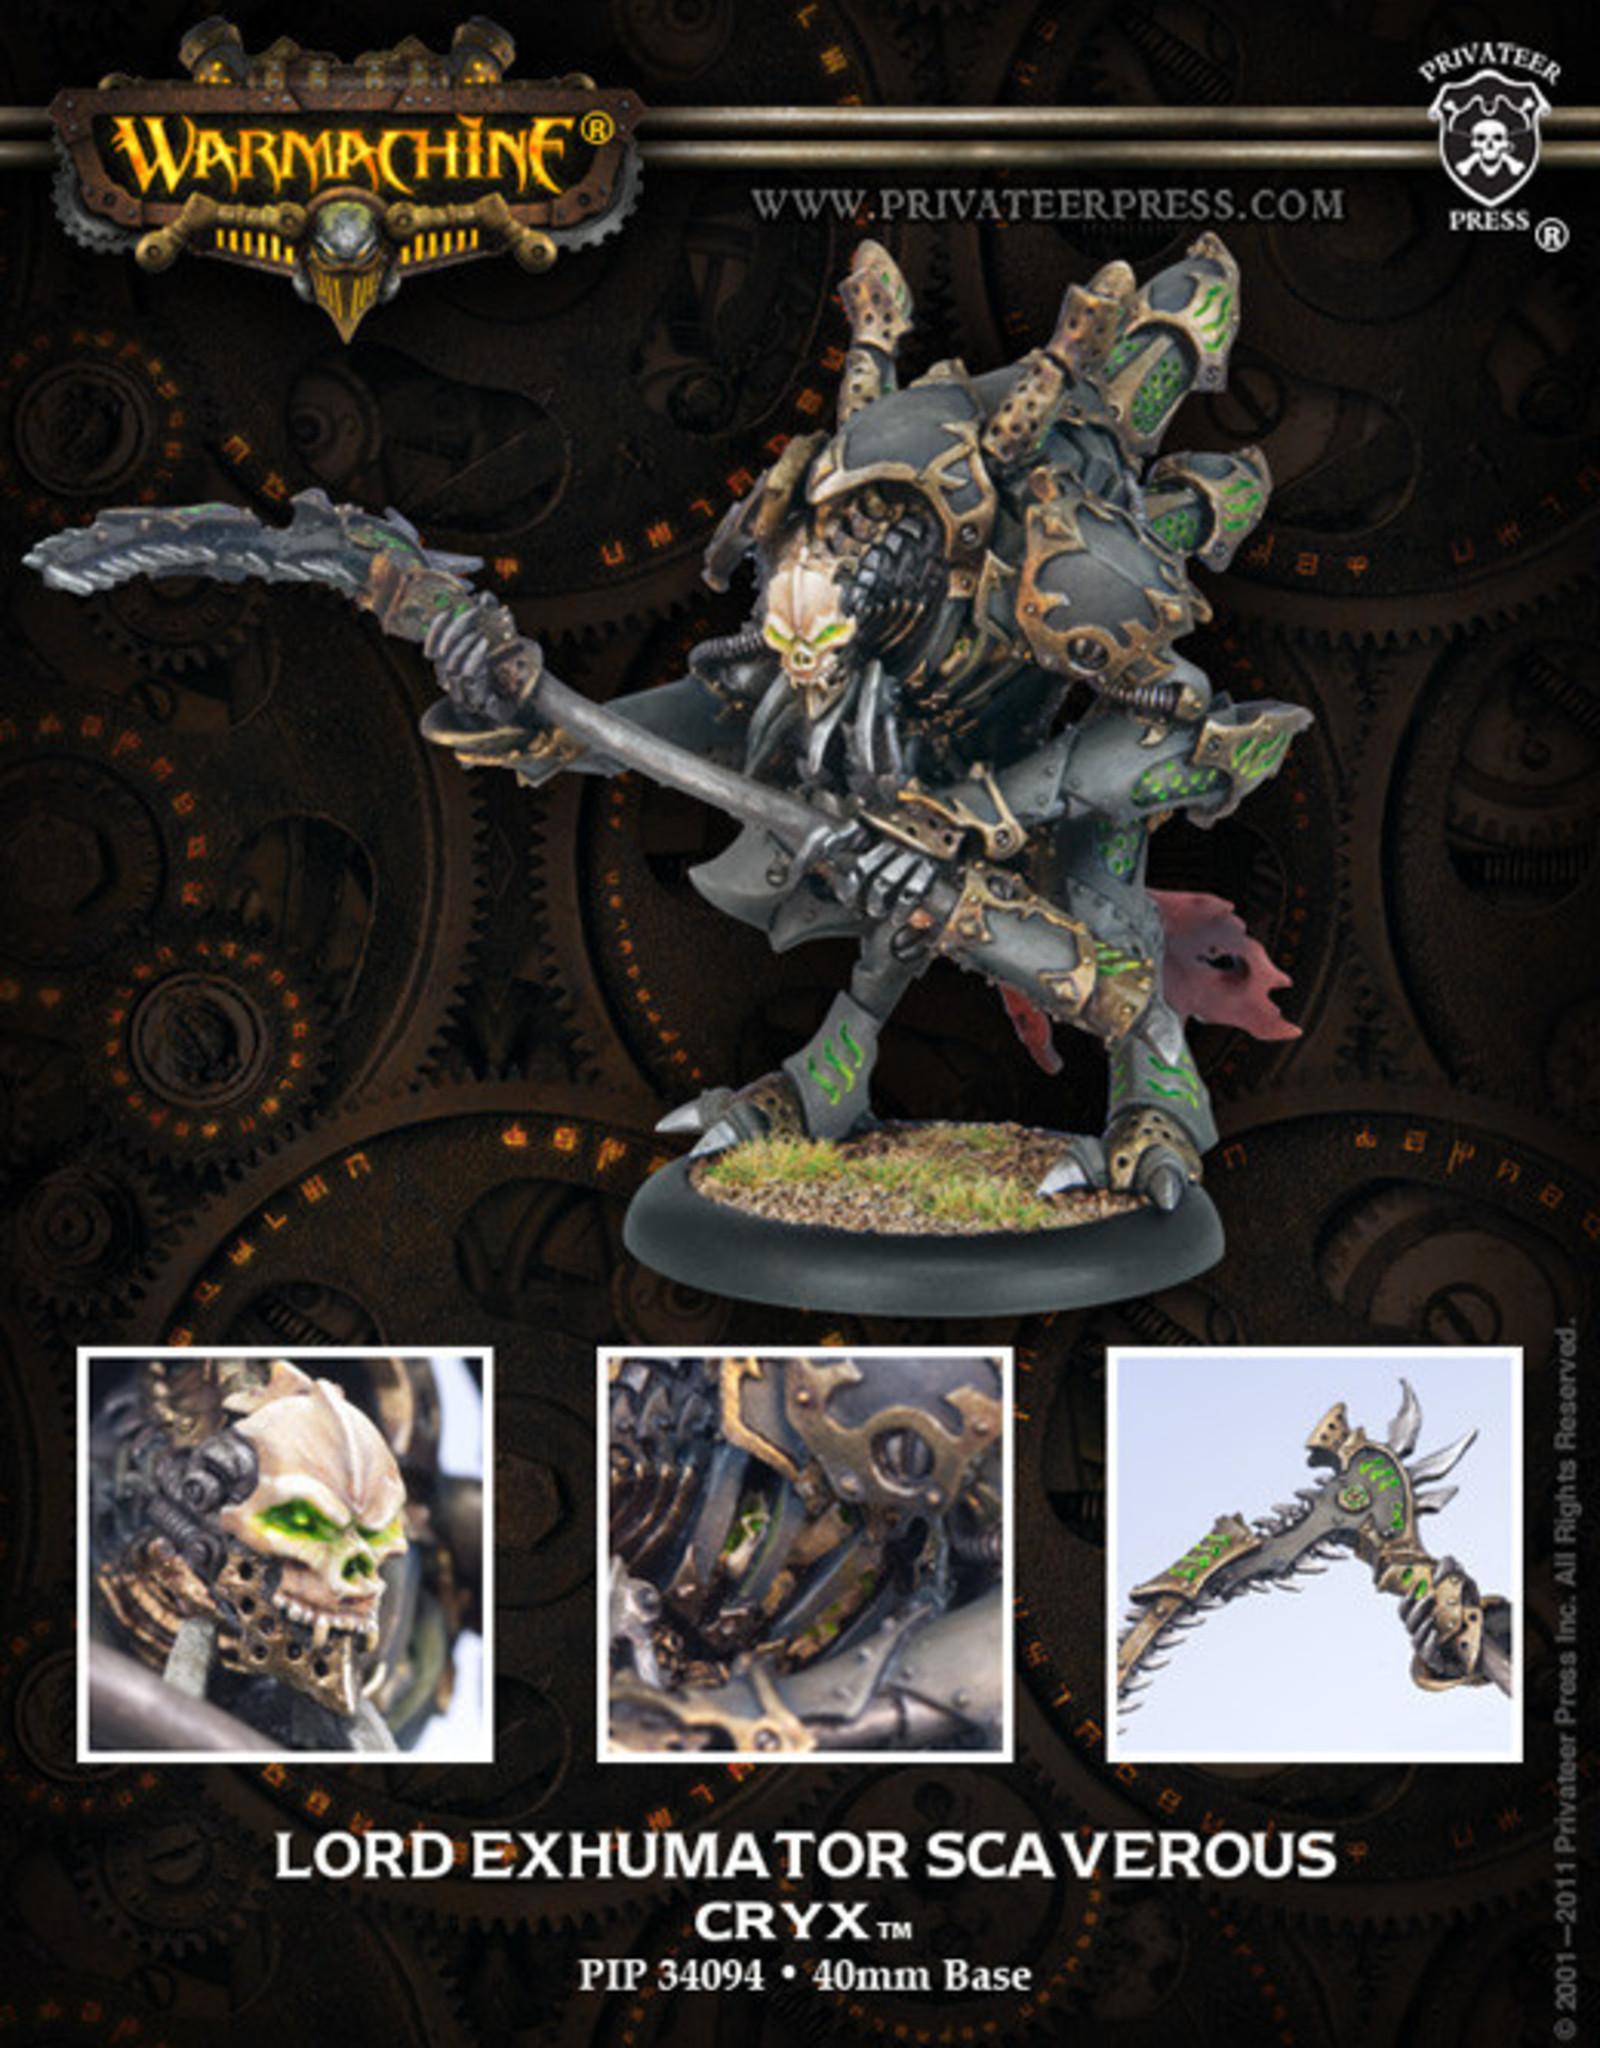 Warmachine Cryx - Lord Exhumator Scaverous